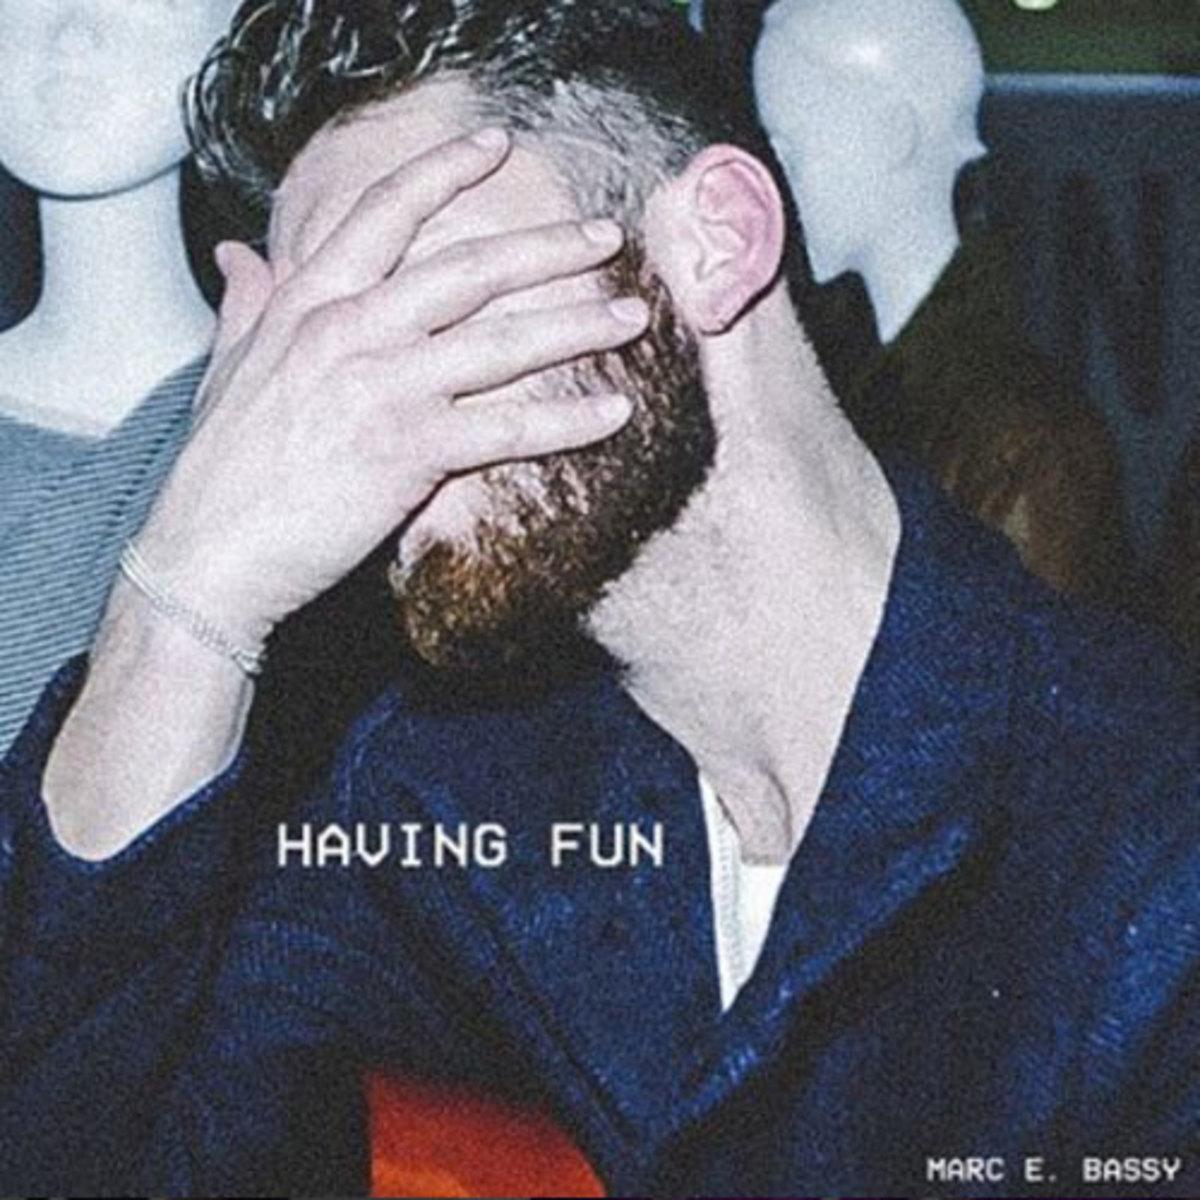 marc-e-bassy-having-fun.jpg